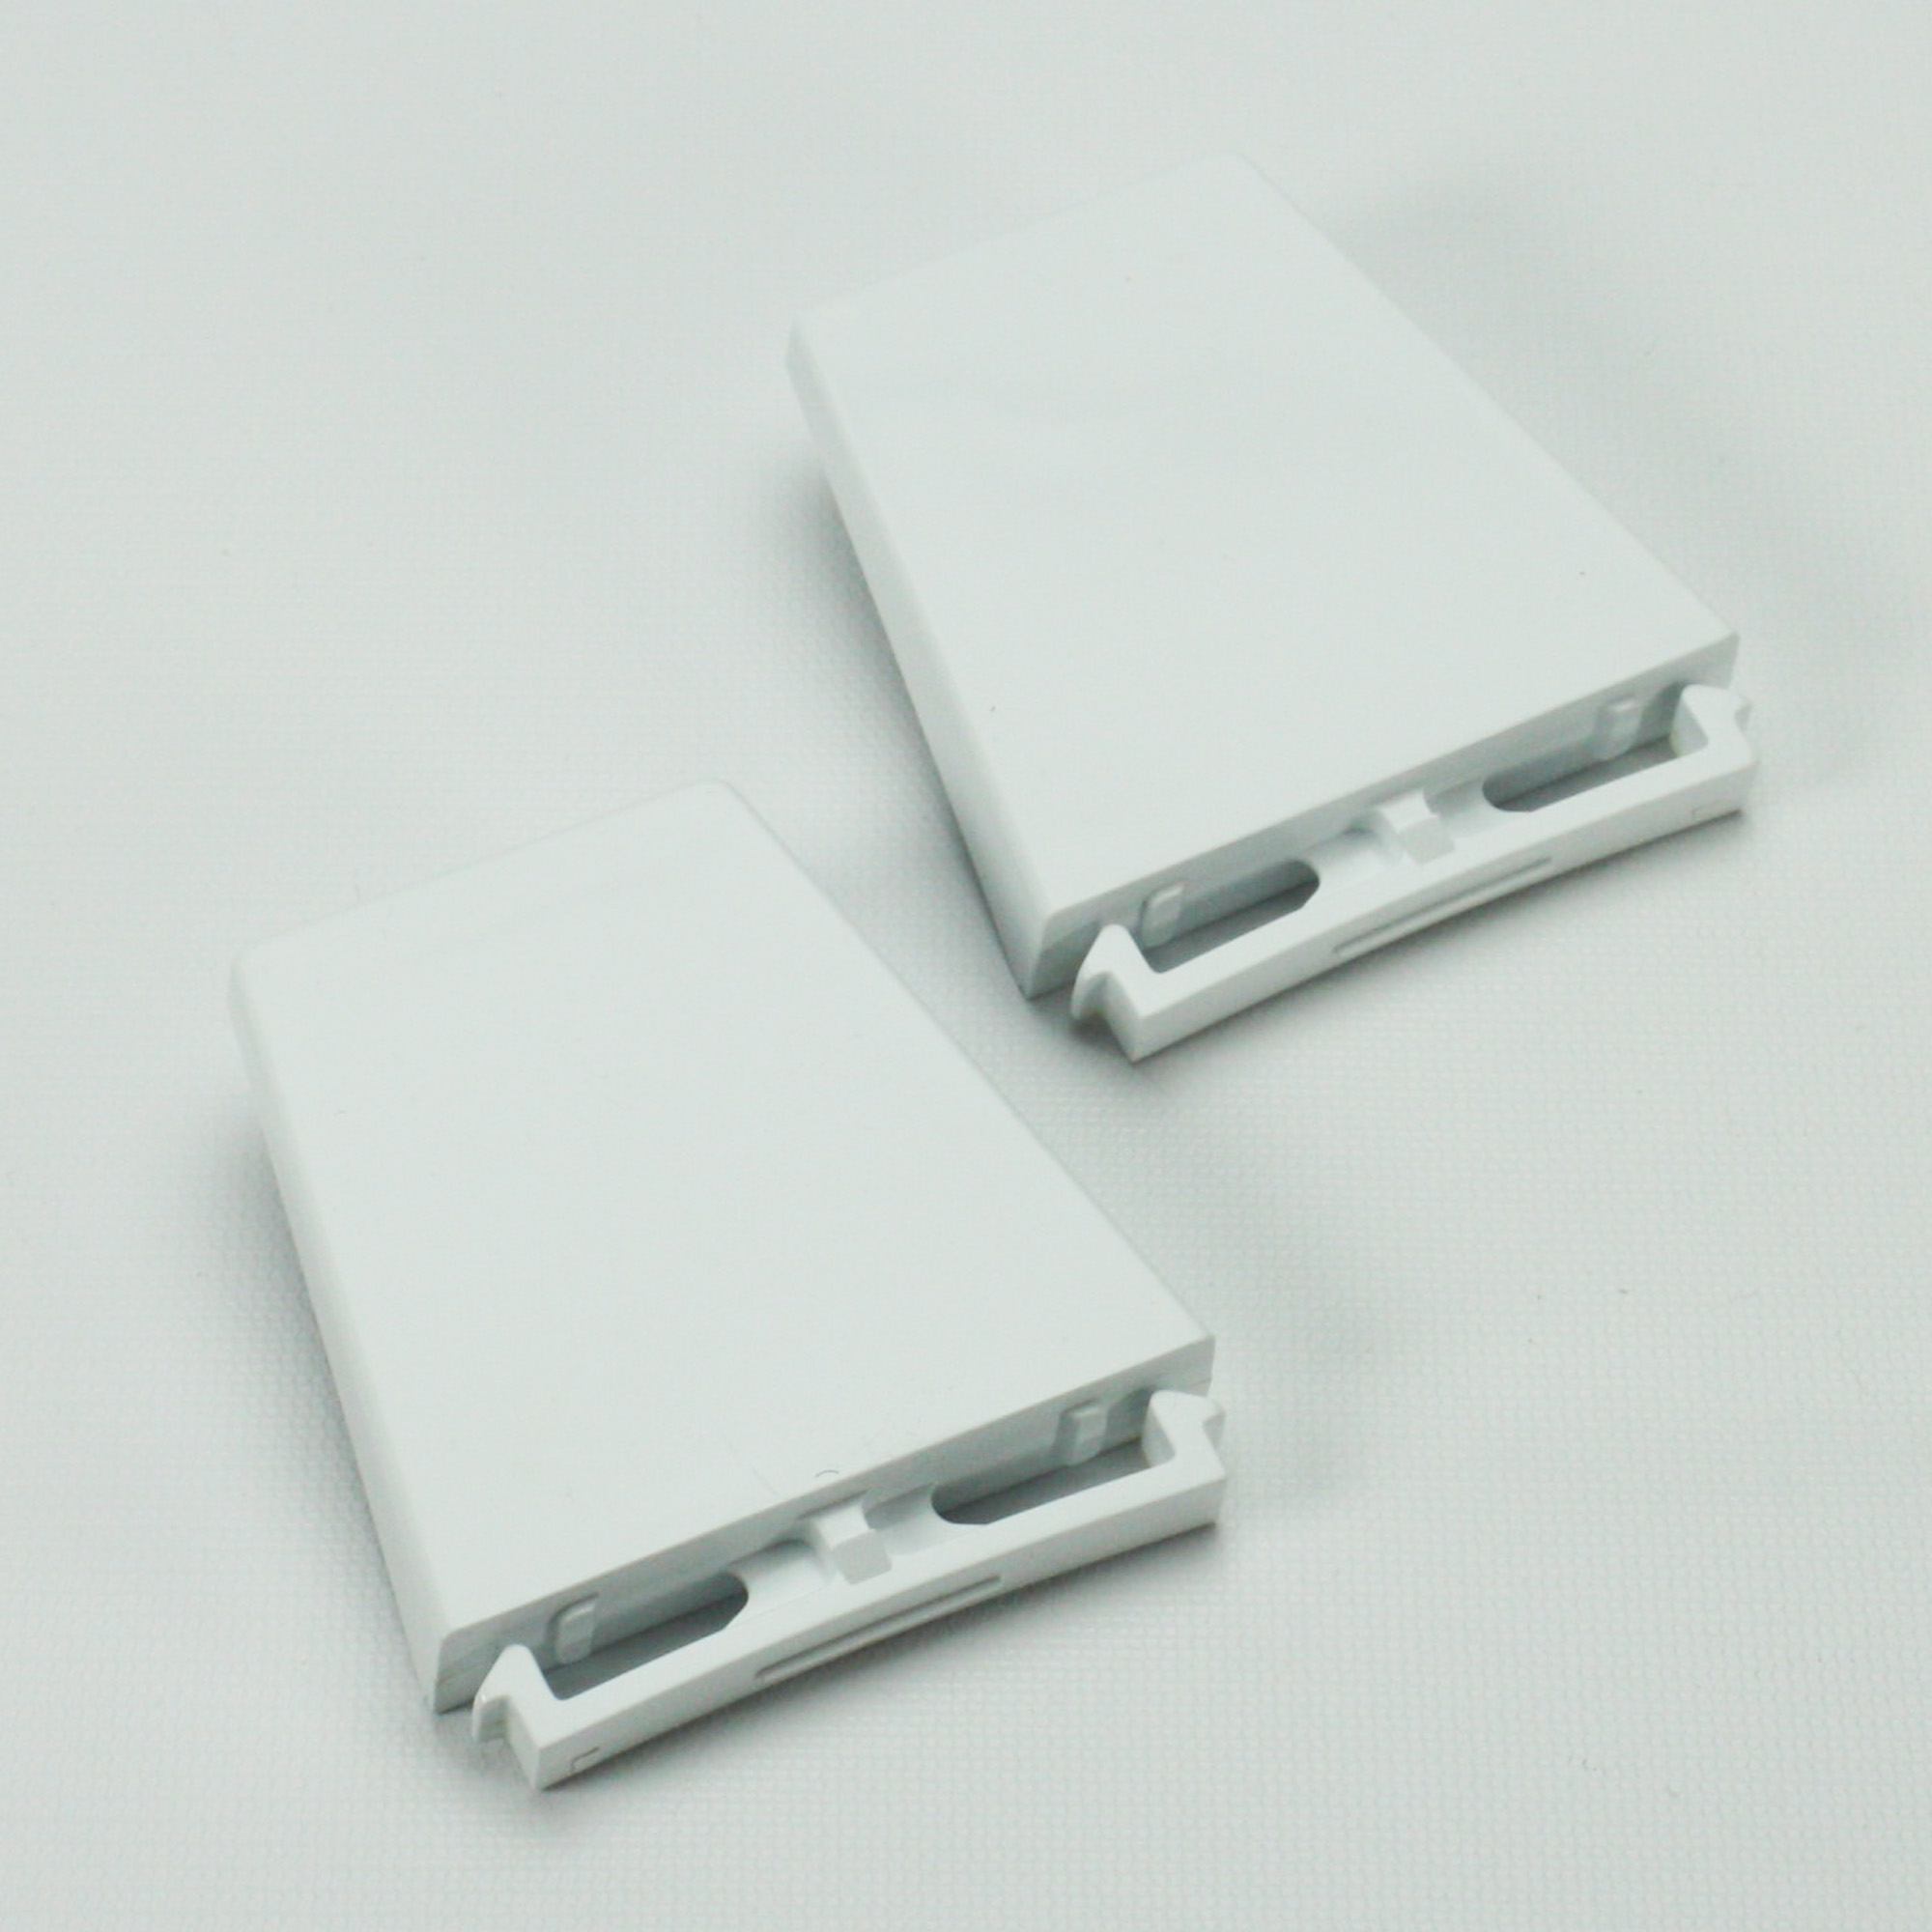 4318297 whirlpool refrigerator door shelf end caps ebay. Black Bedroom Furniture Sets. Home Design Ideas